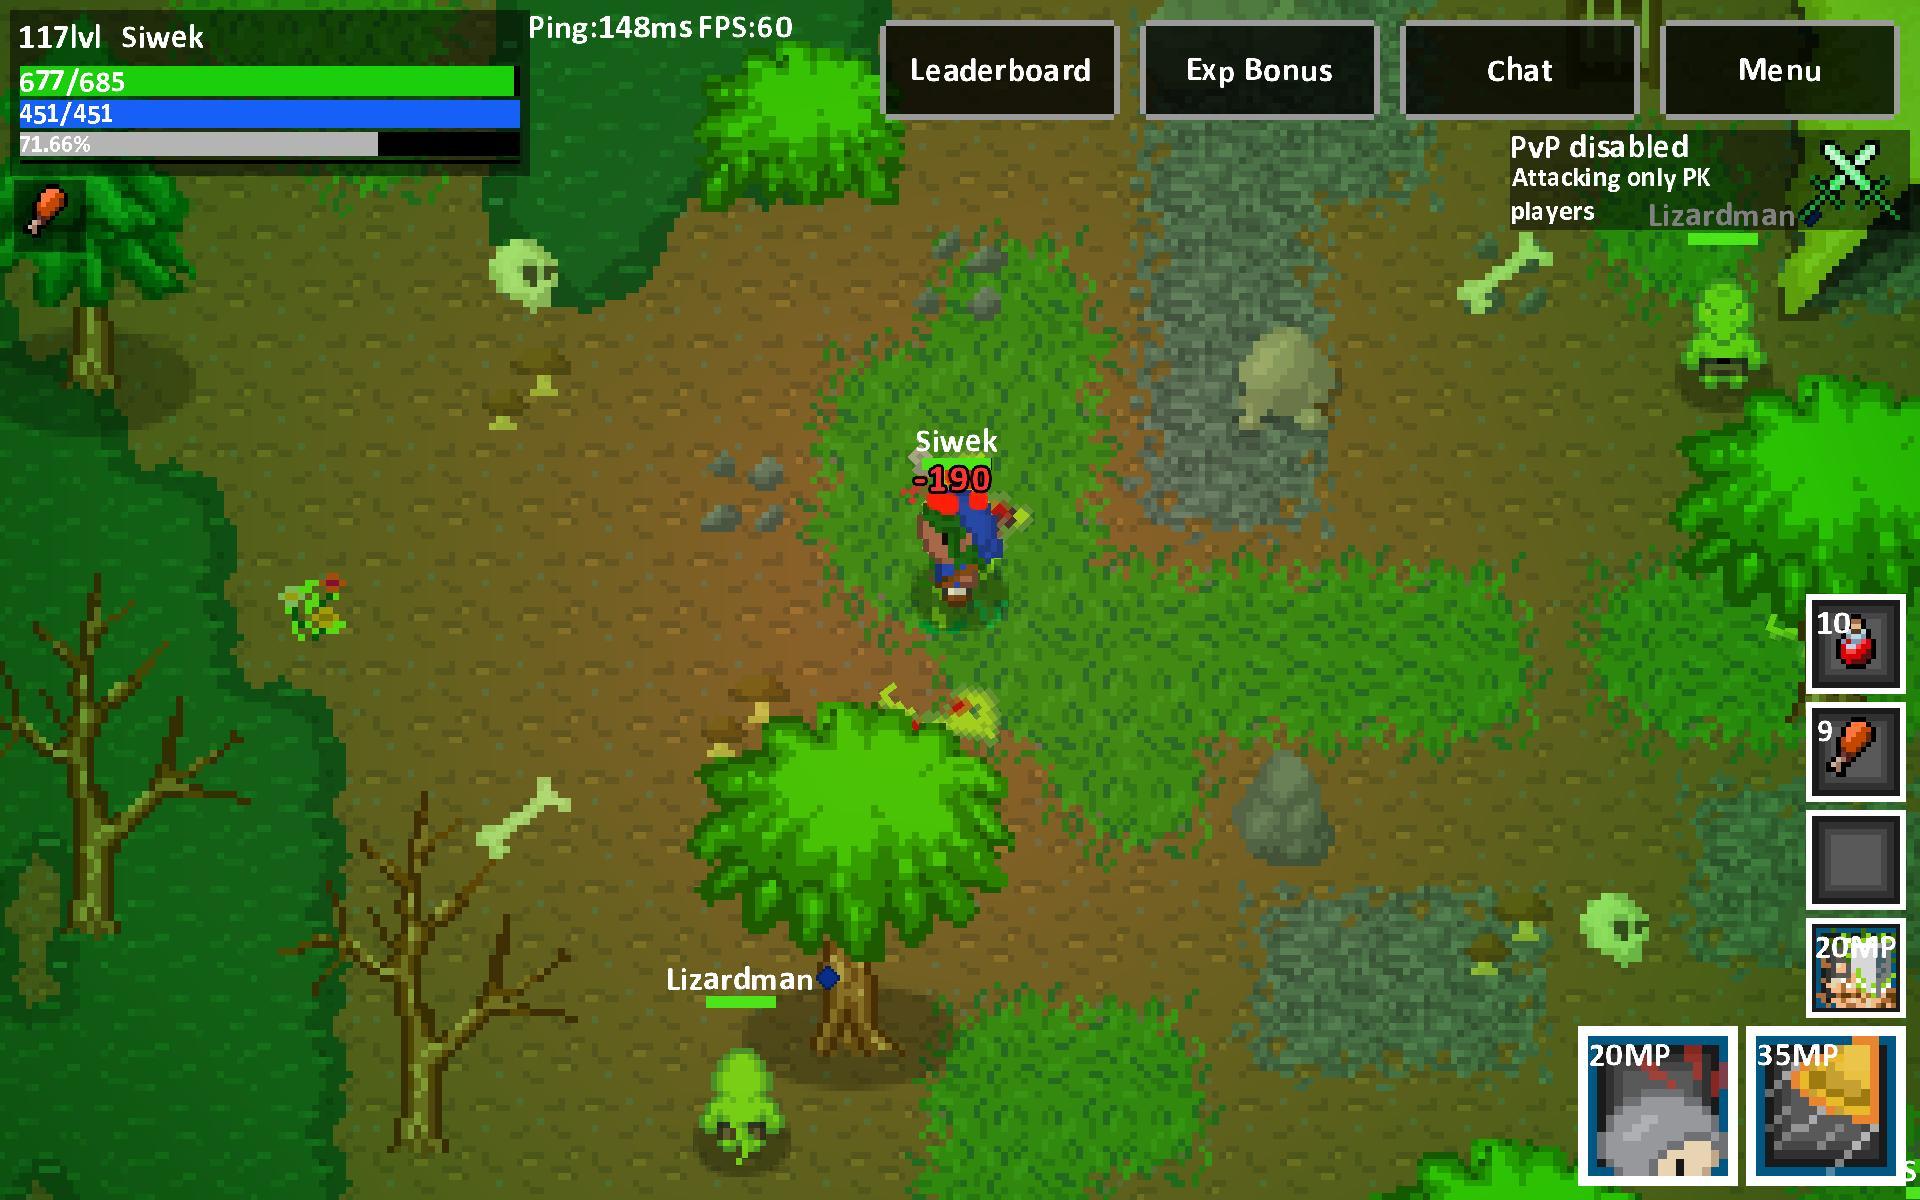 Heroes & Rats MMORPG Online 0.32.2 Screenshot 11